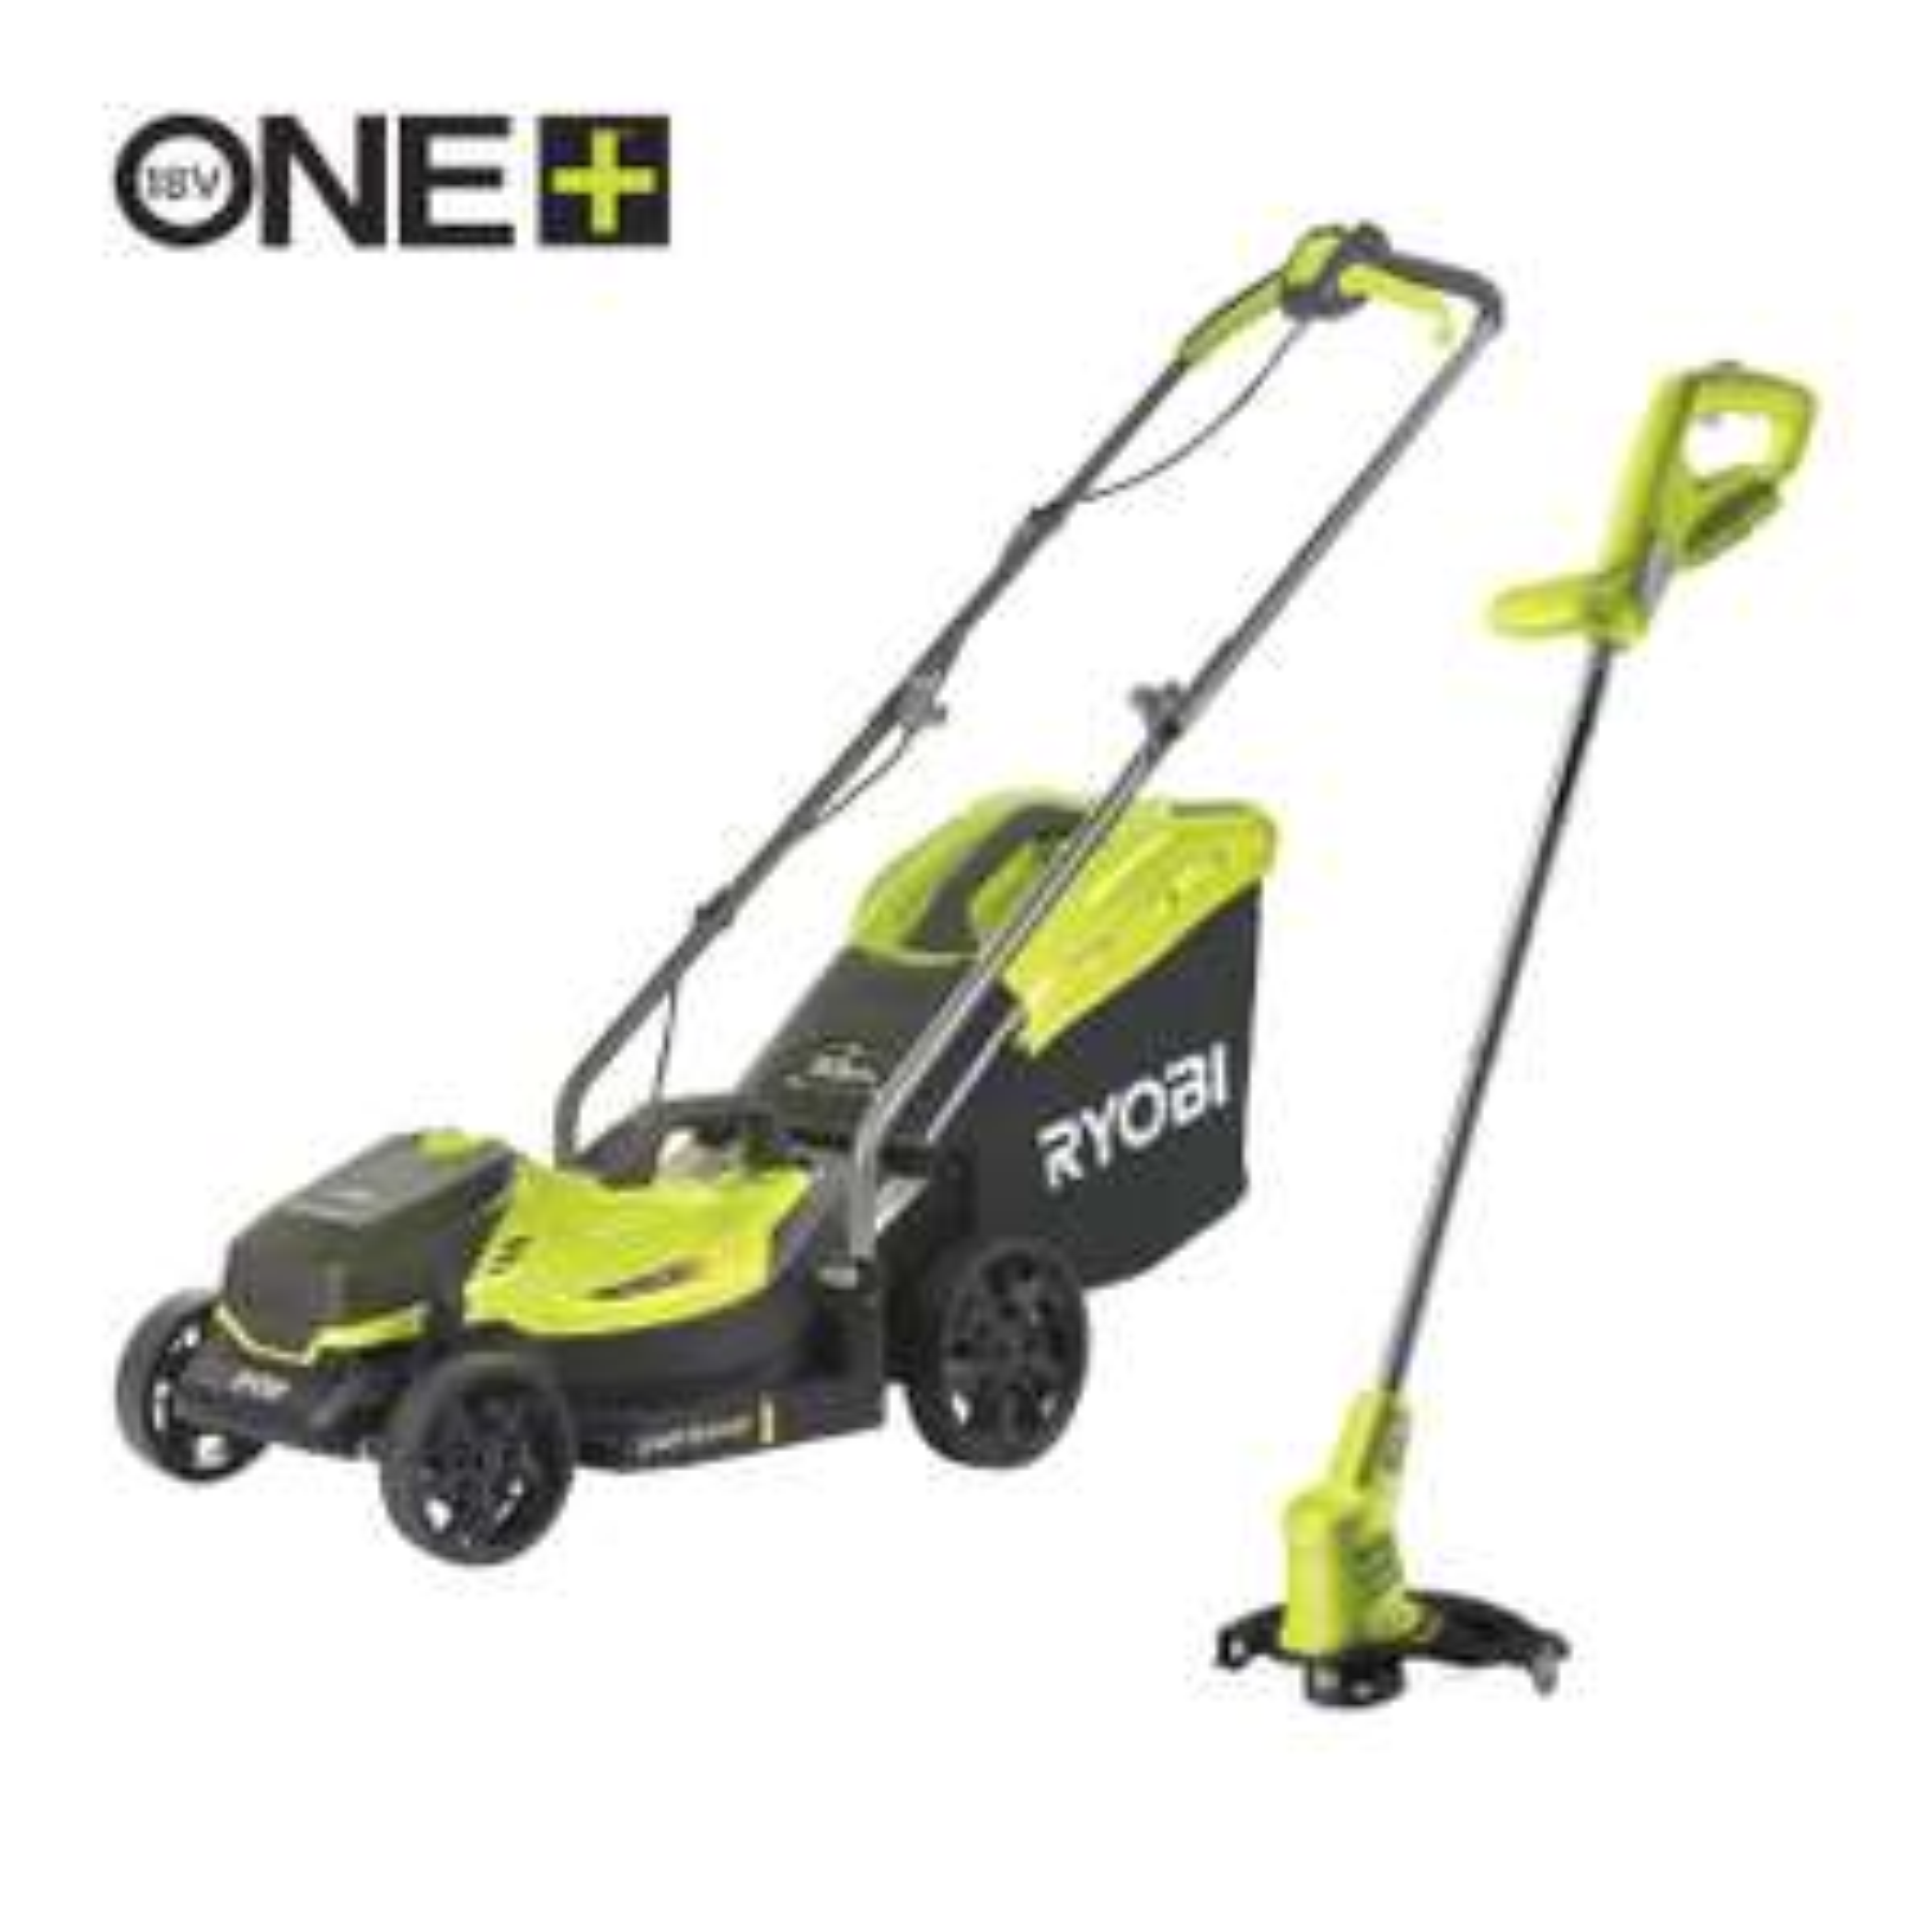 Ryobi 18V ONE+™ Cordless 33cm Lawnmower & 25cm Grass Trimmer & 1 x 4.0Ah battery + charger £209.99 at Ryobi UK